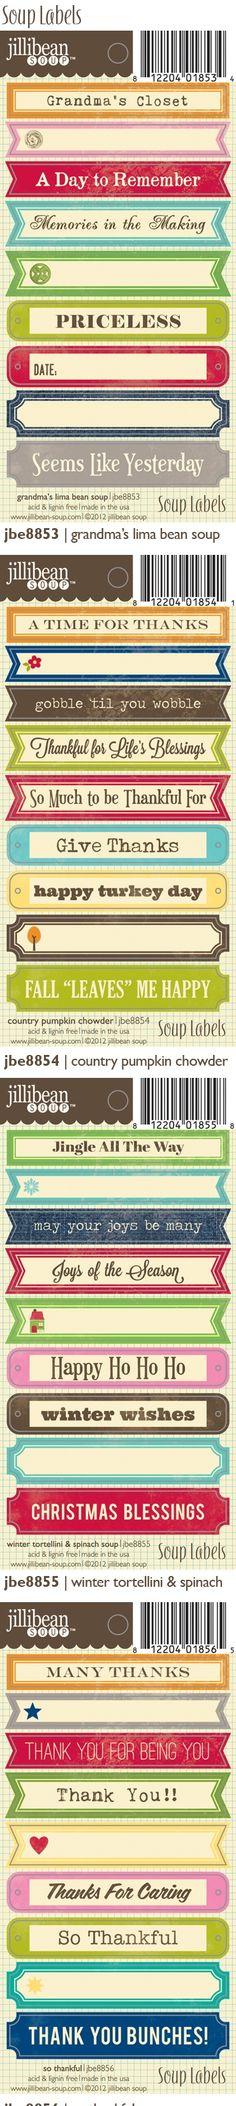 jillibean soup labels cha summer 2012